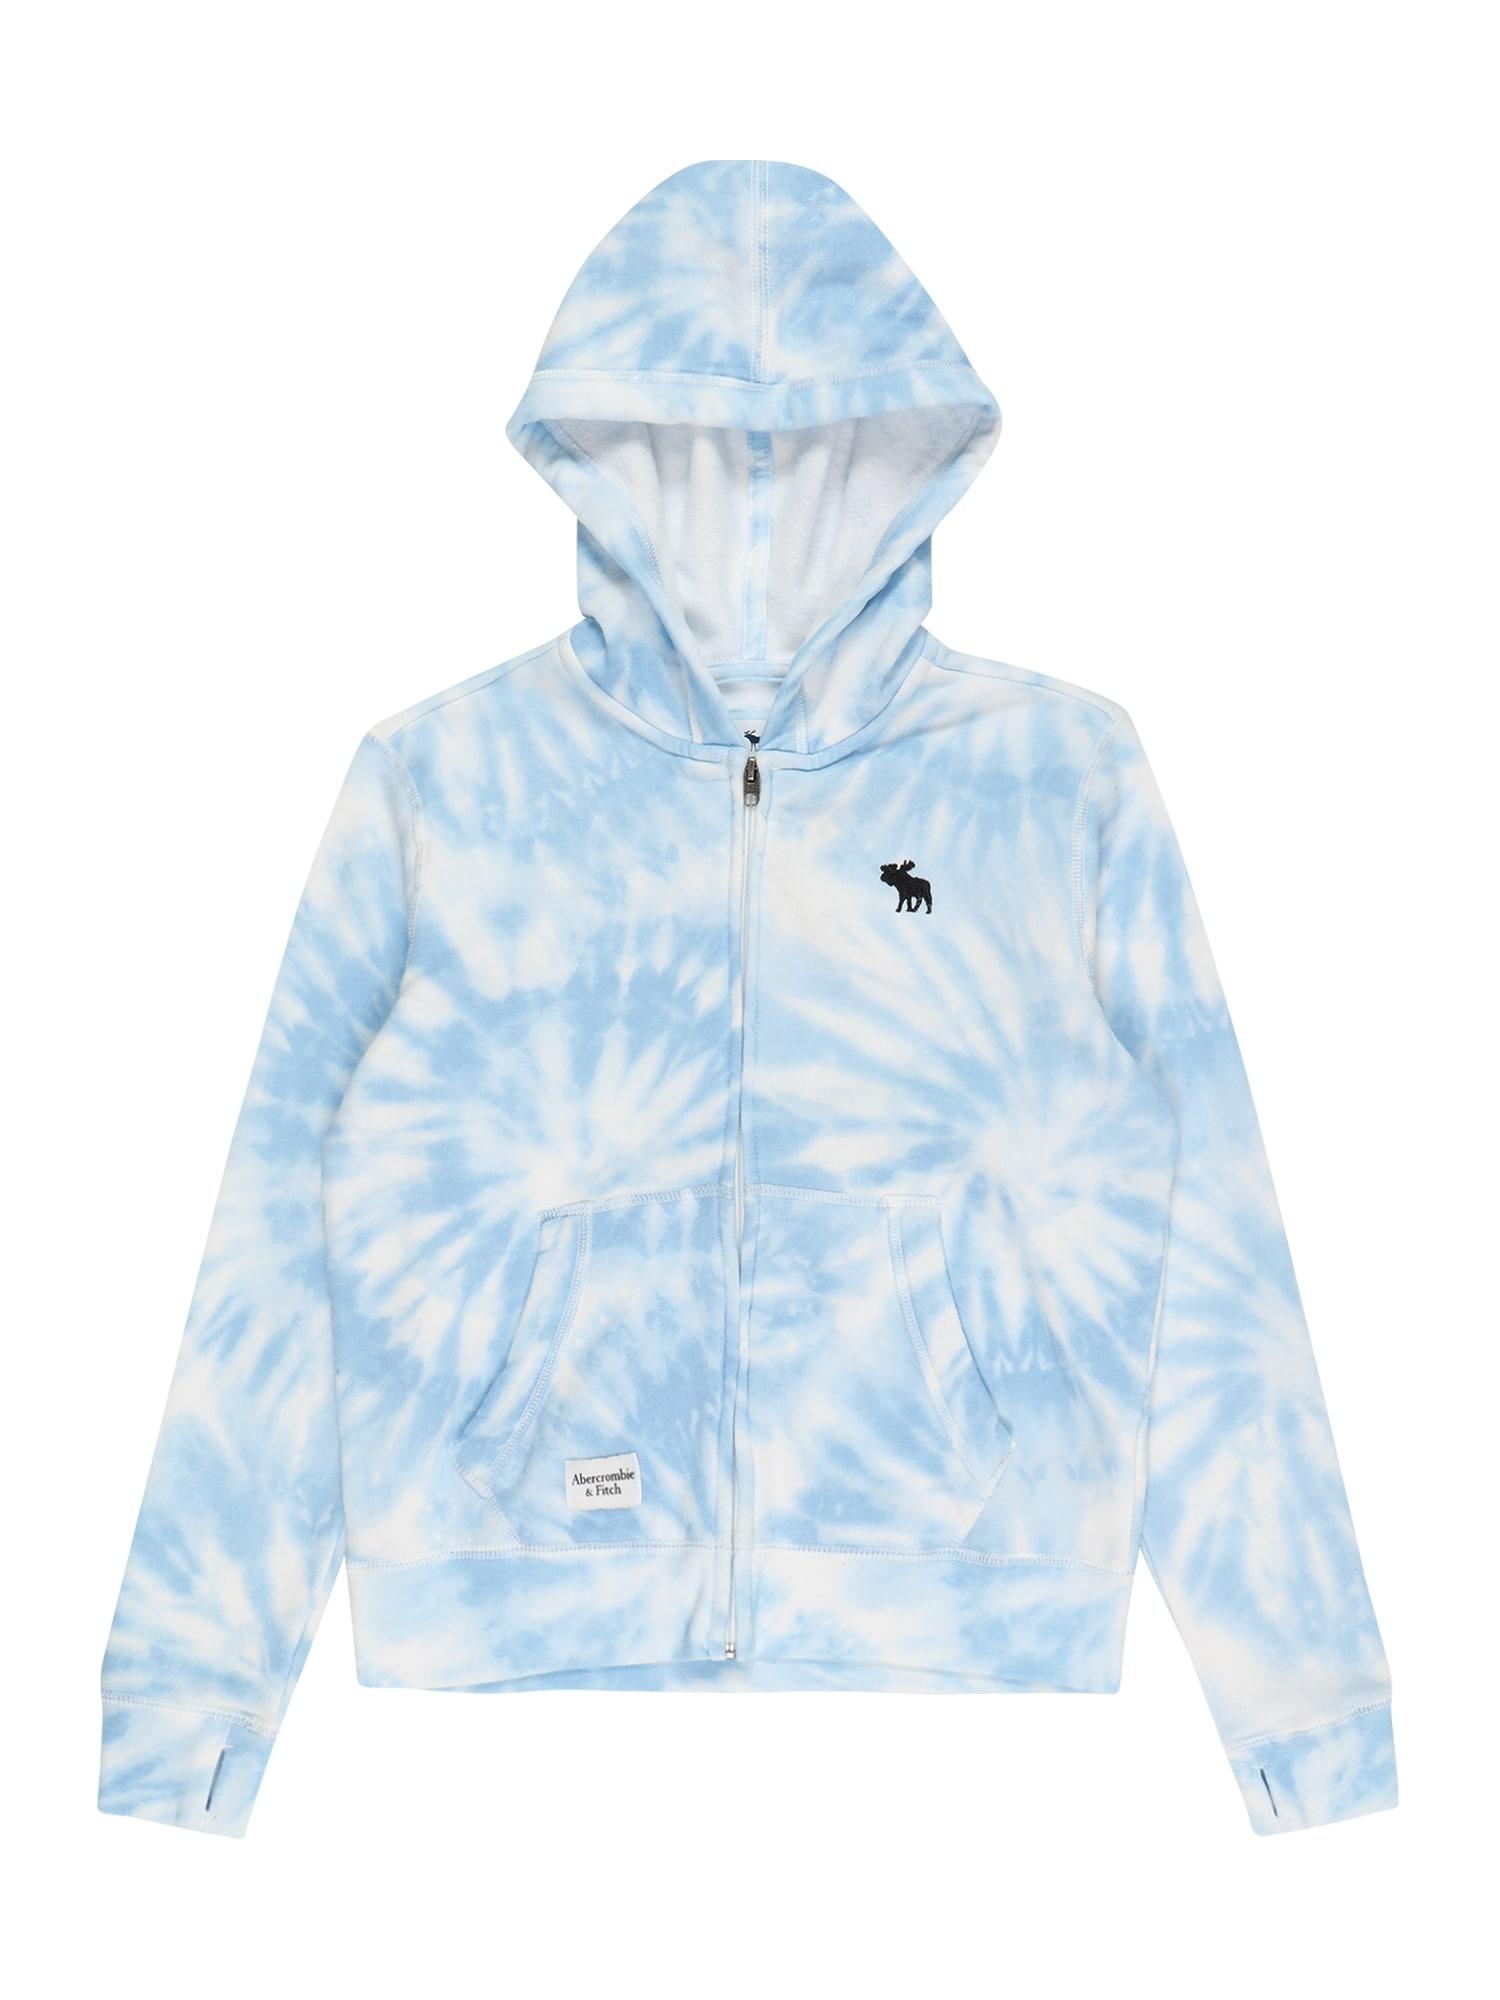 Abercrombie & Fitch Flisinis džemperis mėlyna dūmų spalva / balta